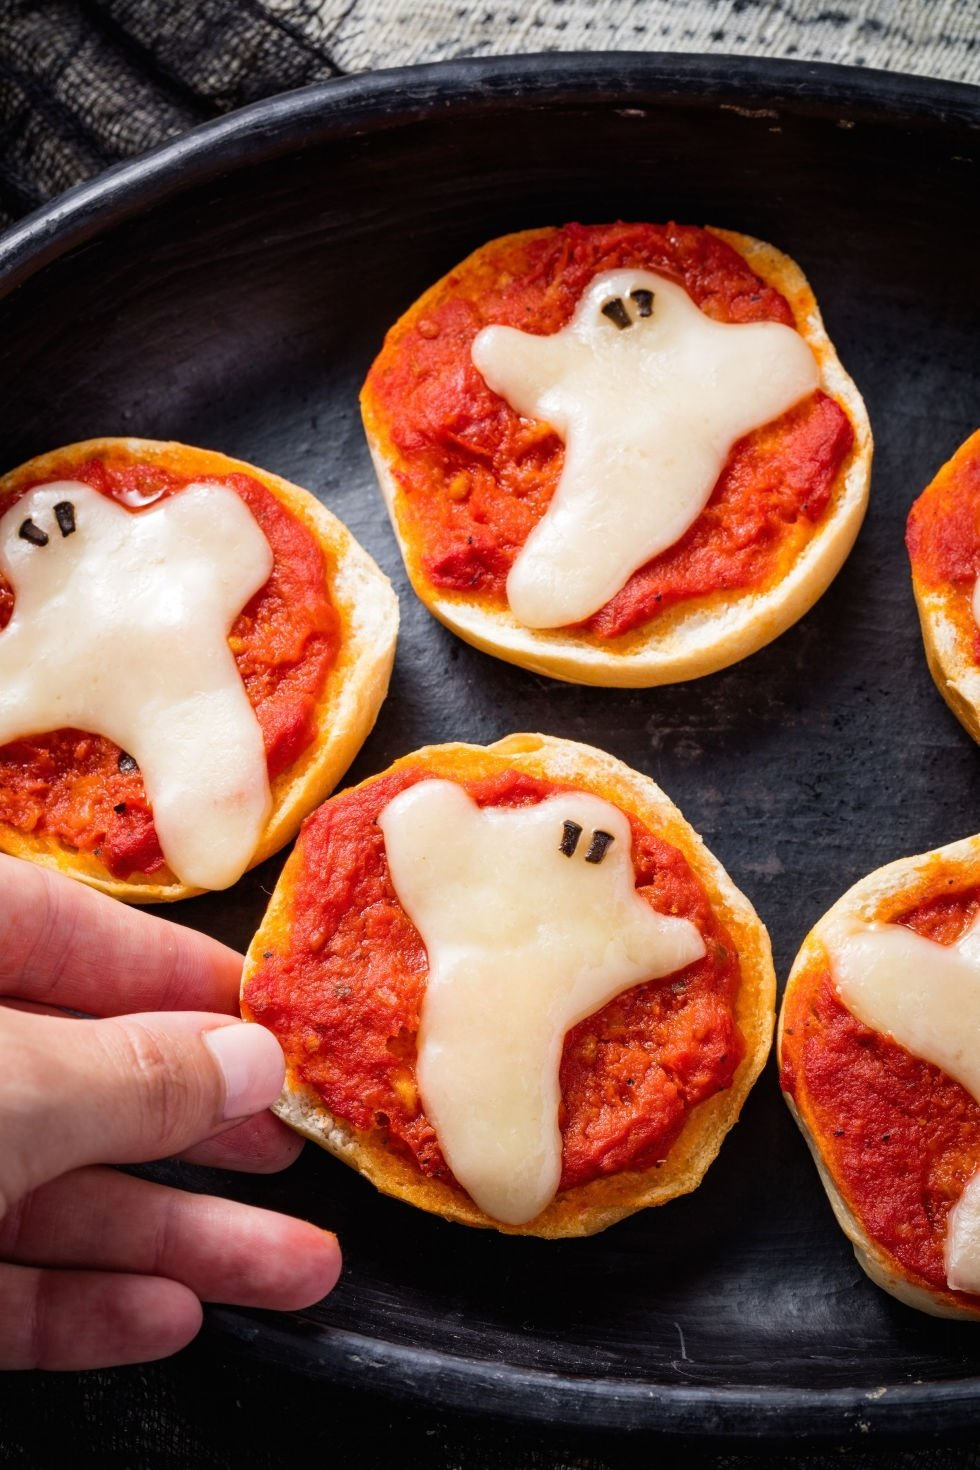 halloween food ideas for kids - mforum